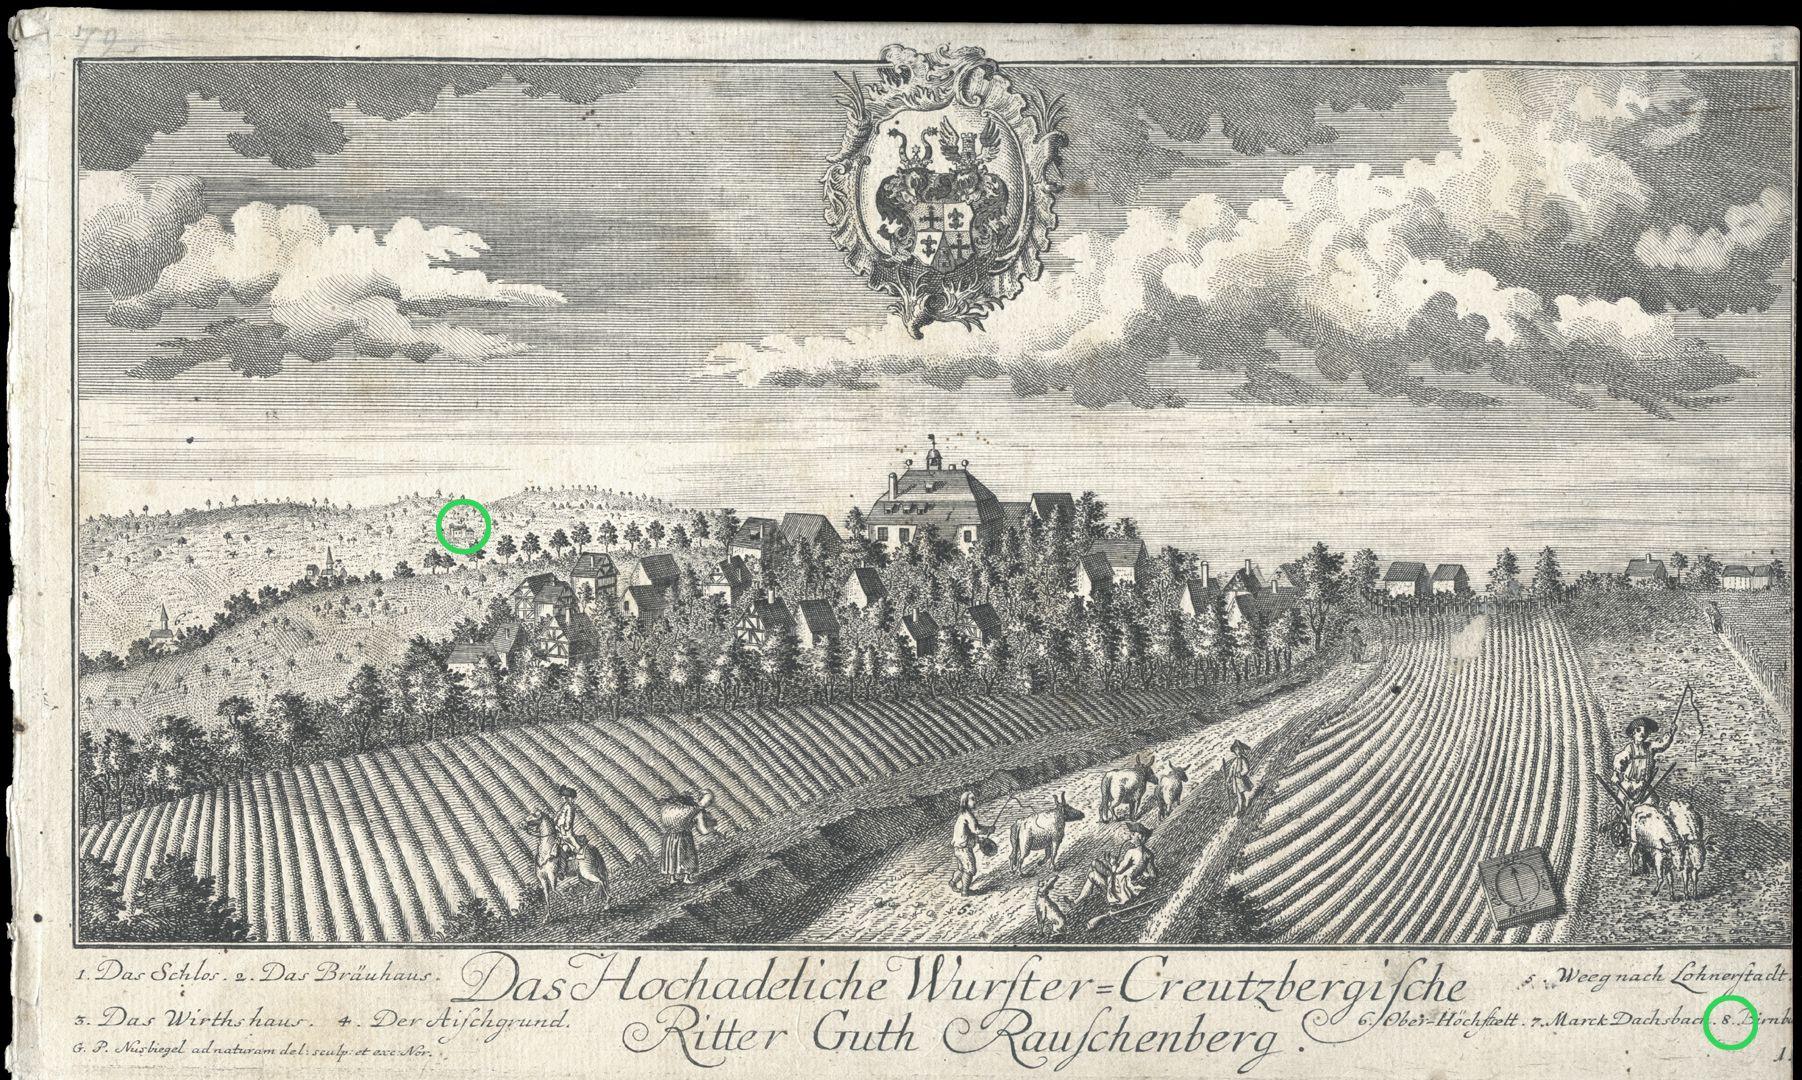 High-nobility-manor Rauschenberg of Wurster-Creutzberg Pear tree